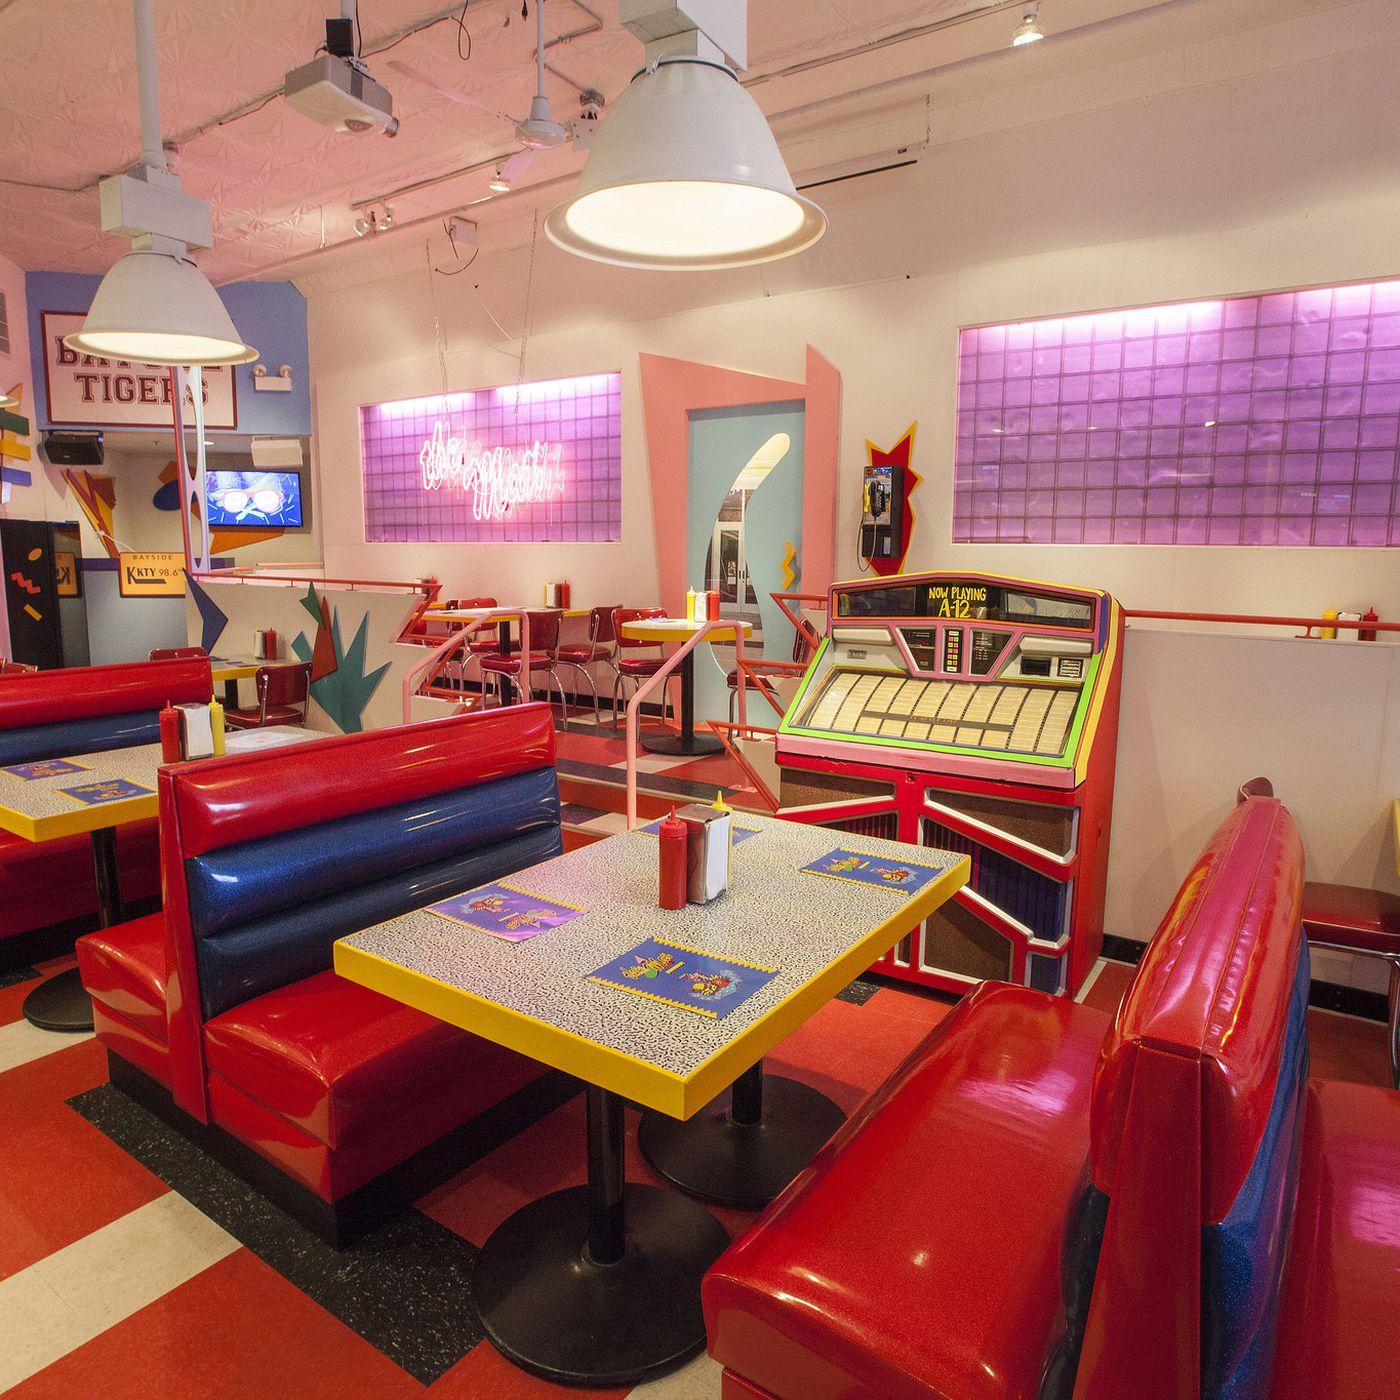 Memphis Design Pop Culture And The Battle Against Good Taste Curbed